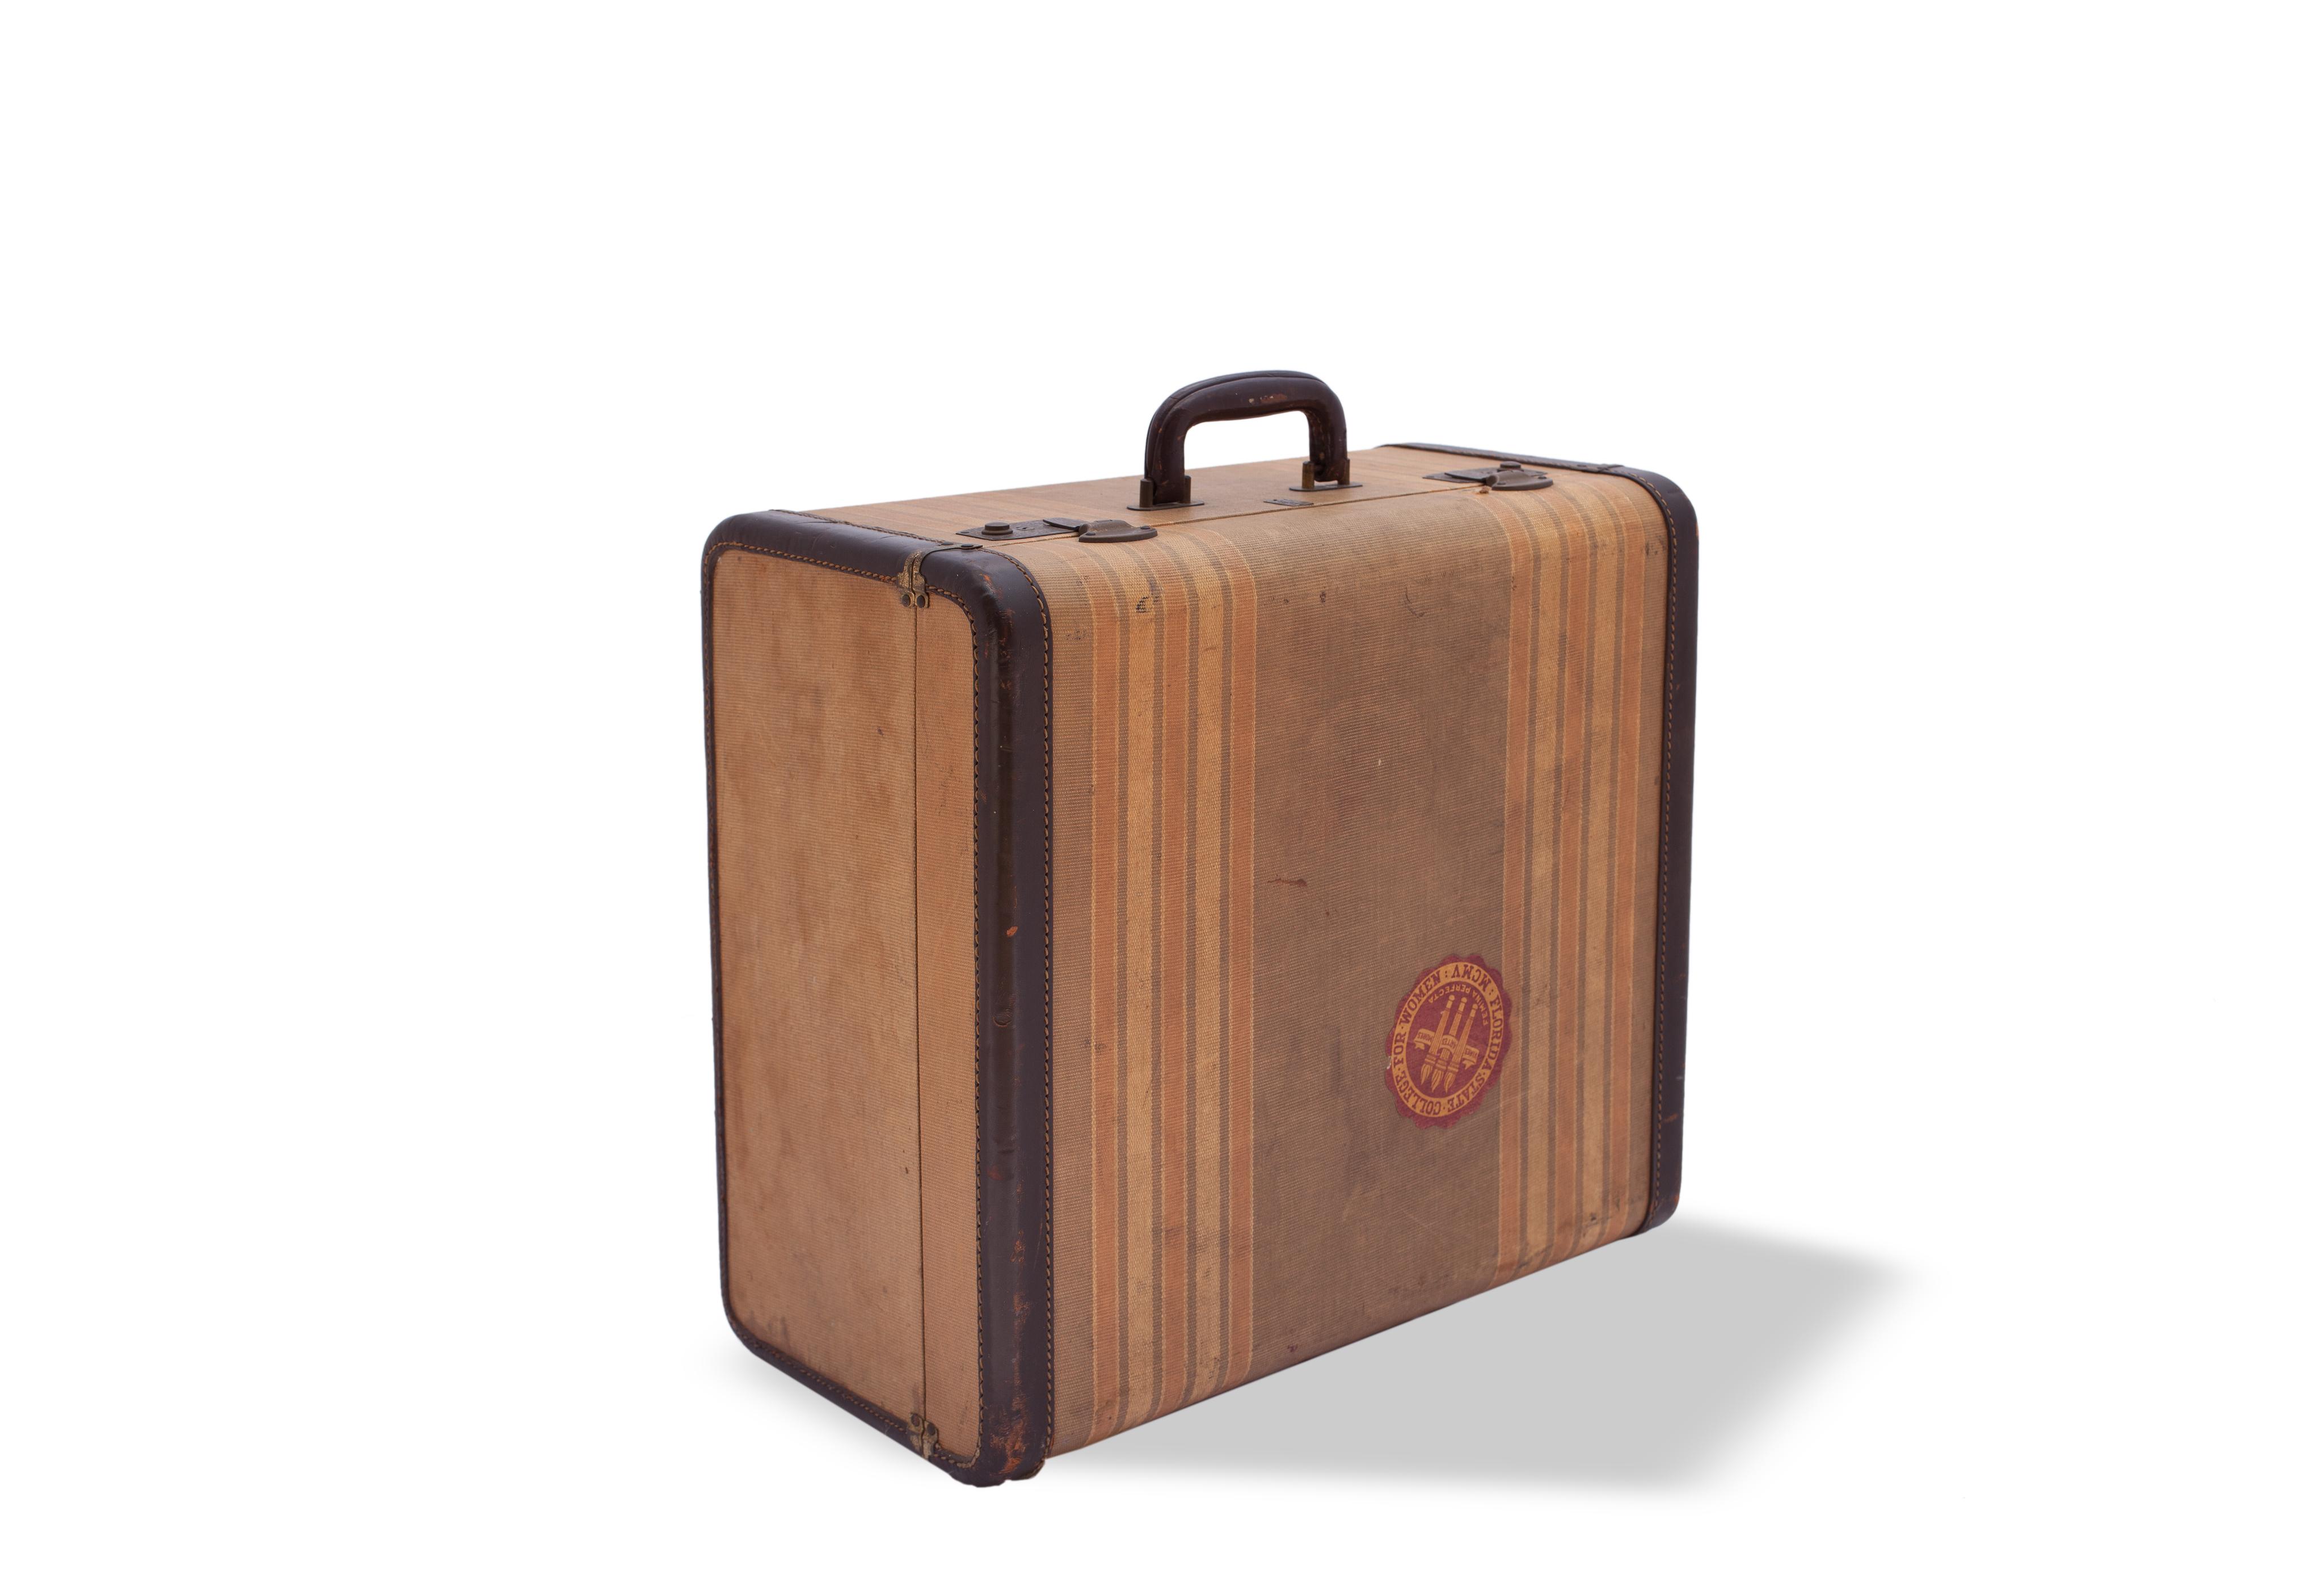 File:Belber Striped Suitcase.jpg